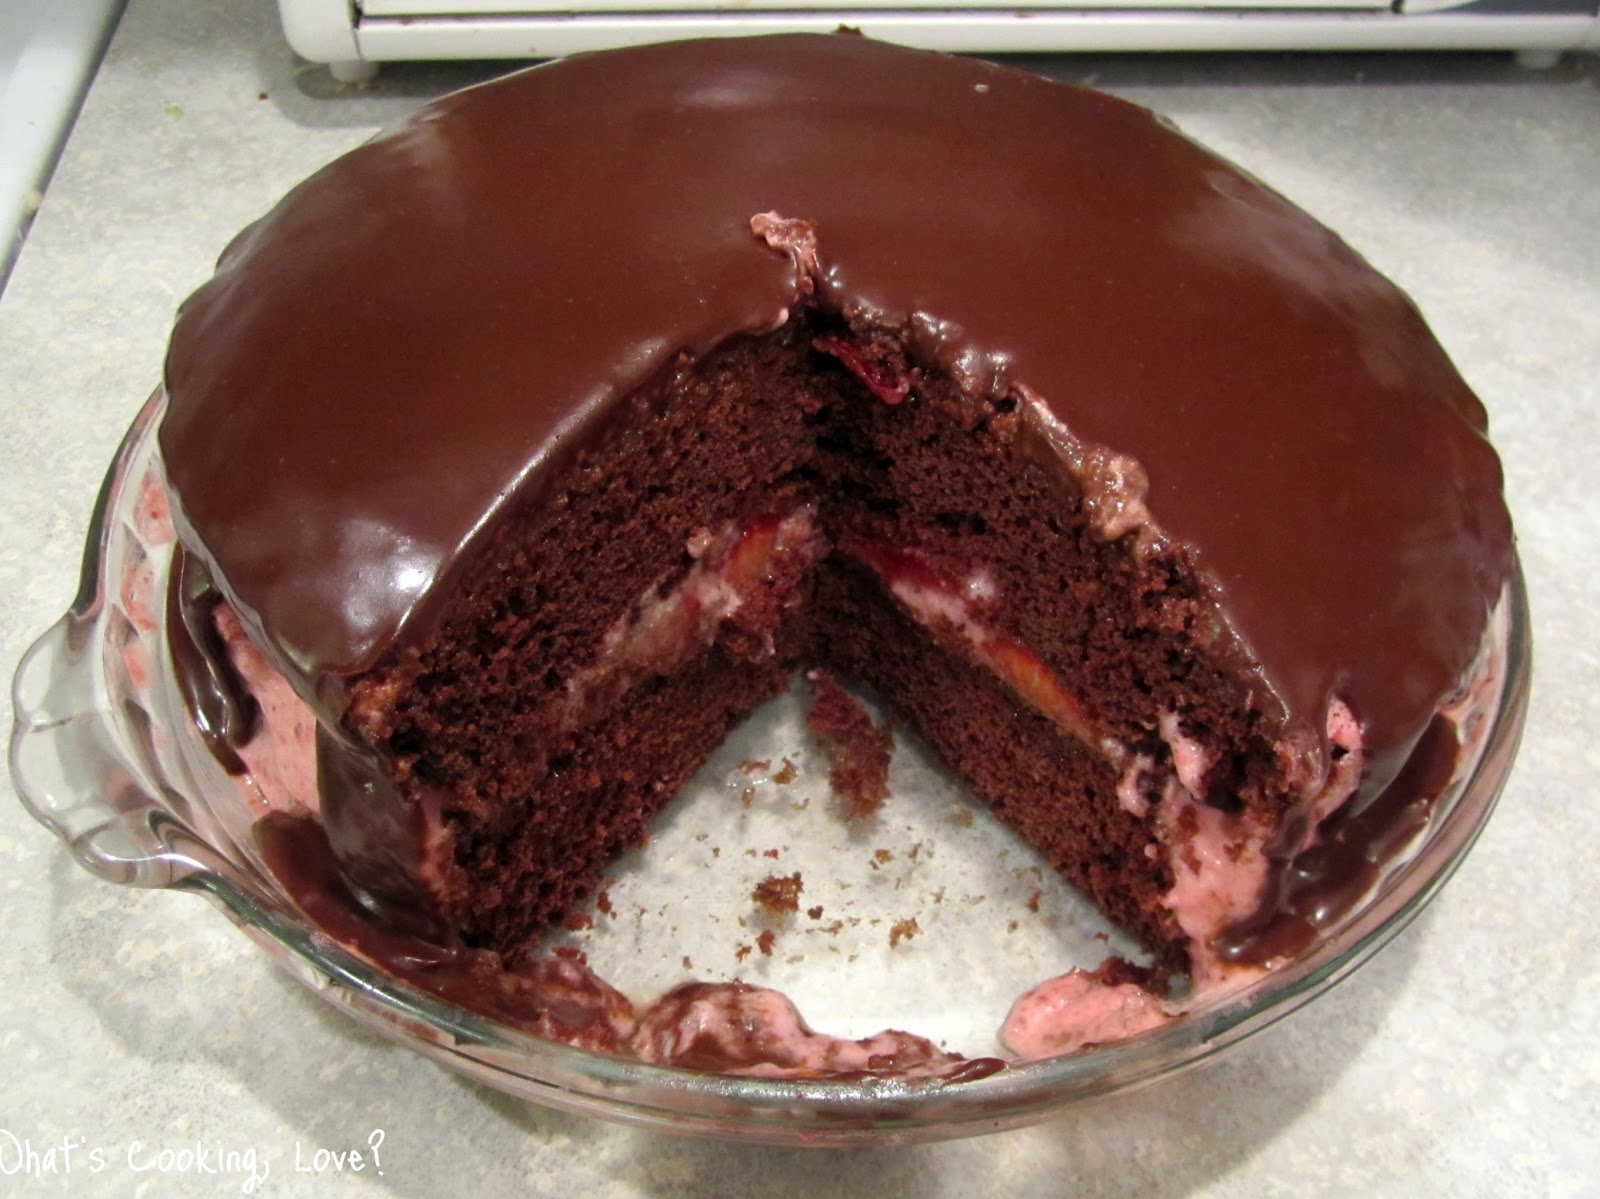 Chocolate Cake With Strawberry Mousse Fillingmarketing